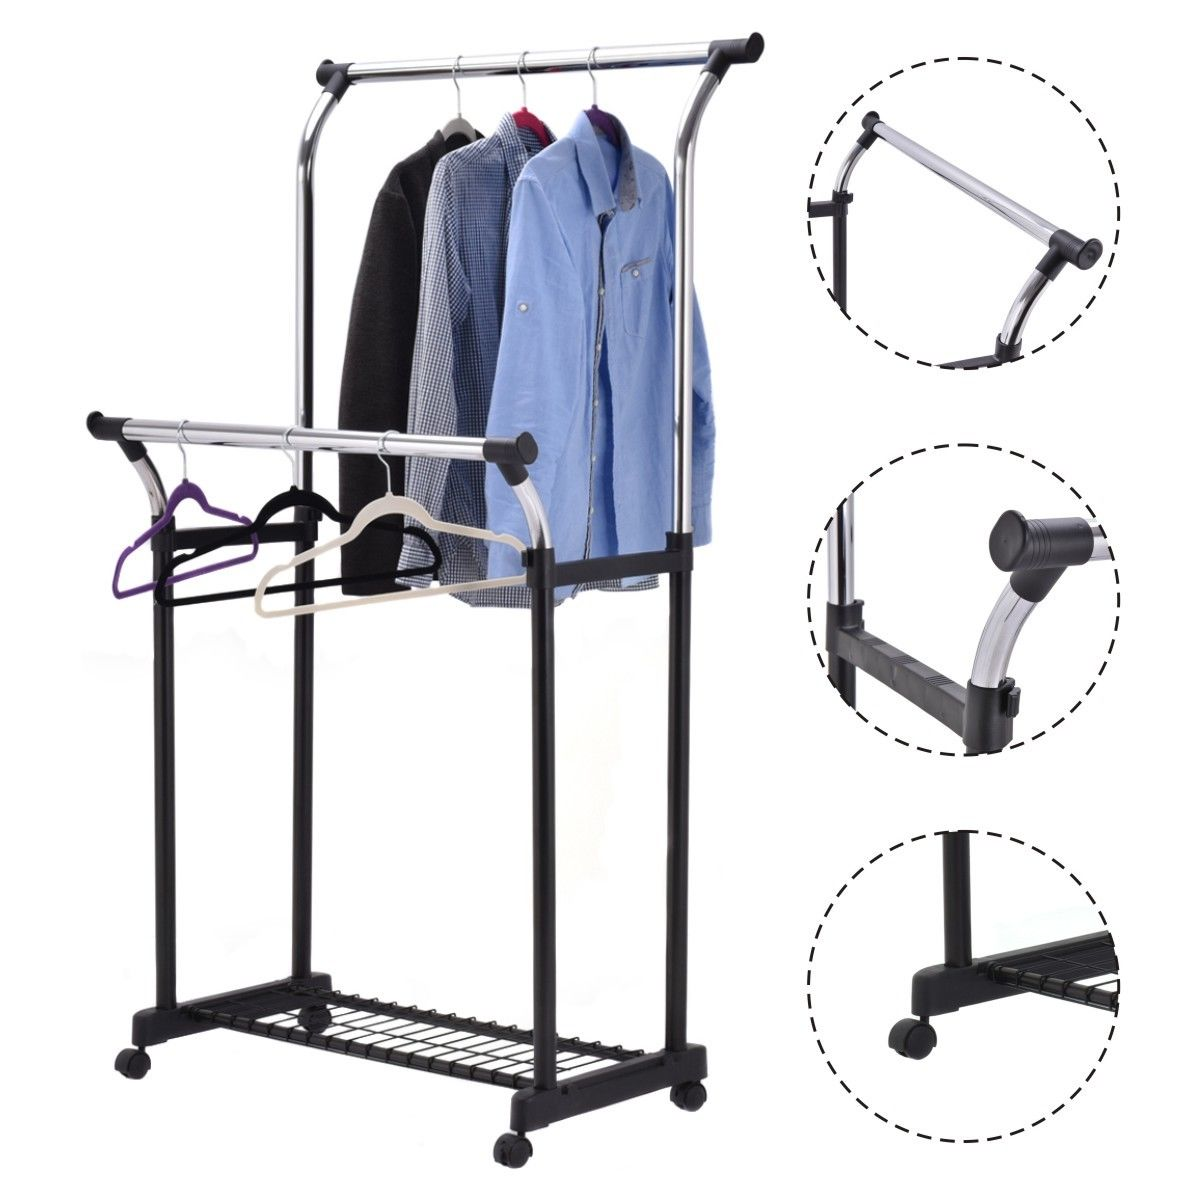 Goplus Double Rail Adjustable Garment Rack Portable